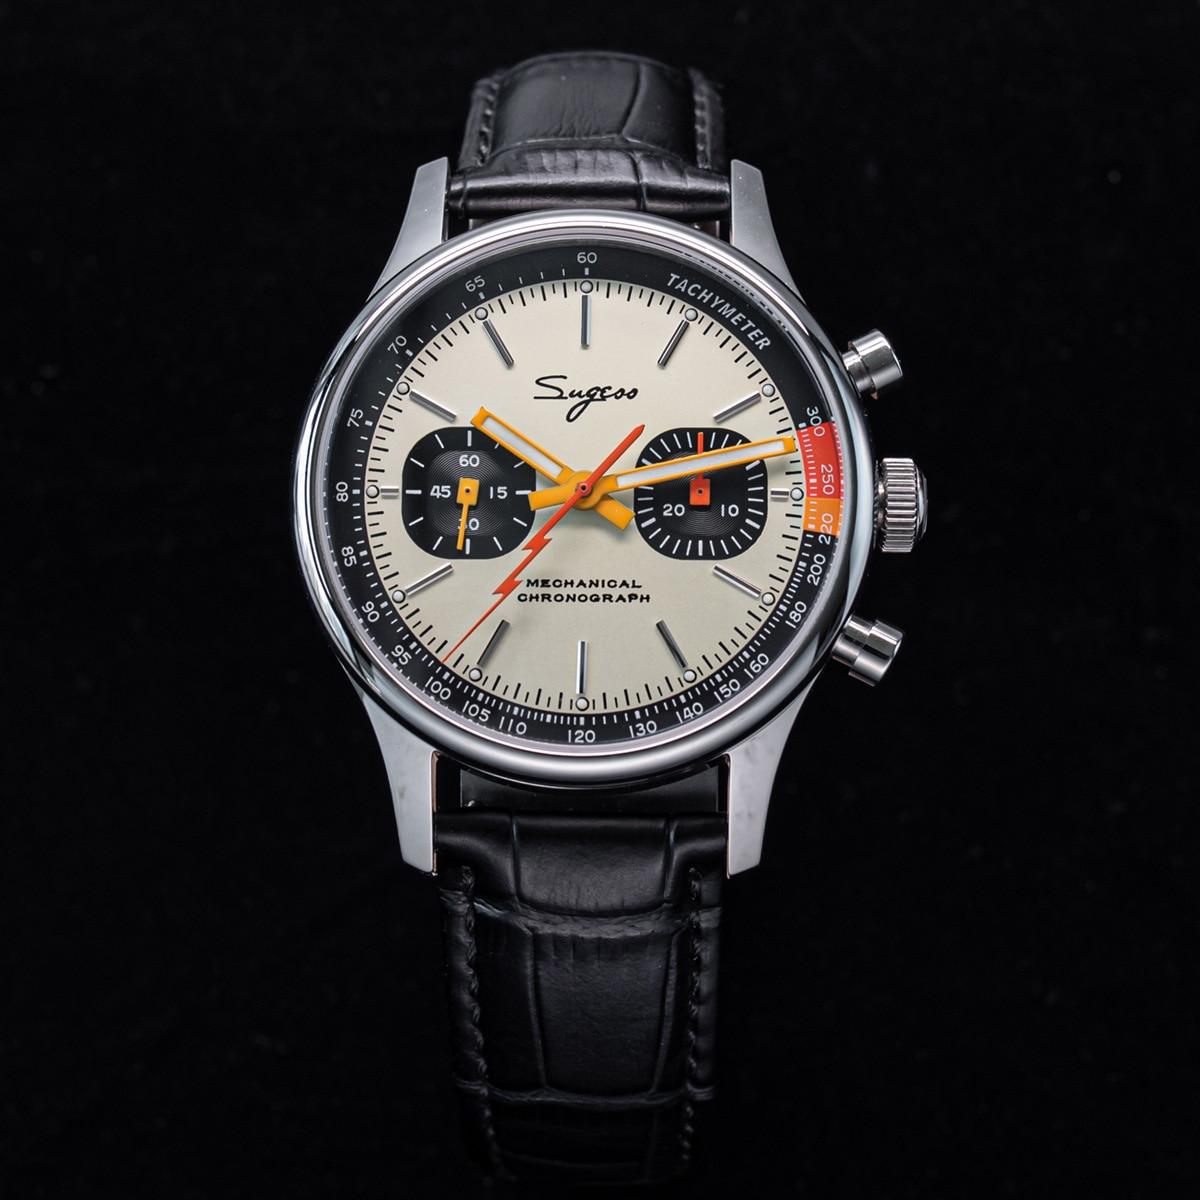 Sugess 2021 ساعة يد ميكانيكية جديدة كرونوغراف ST19 حركة النورس بريم ساعات المعصم طيار الجيش Reloj Hombre Sappire Limited